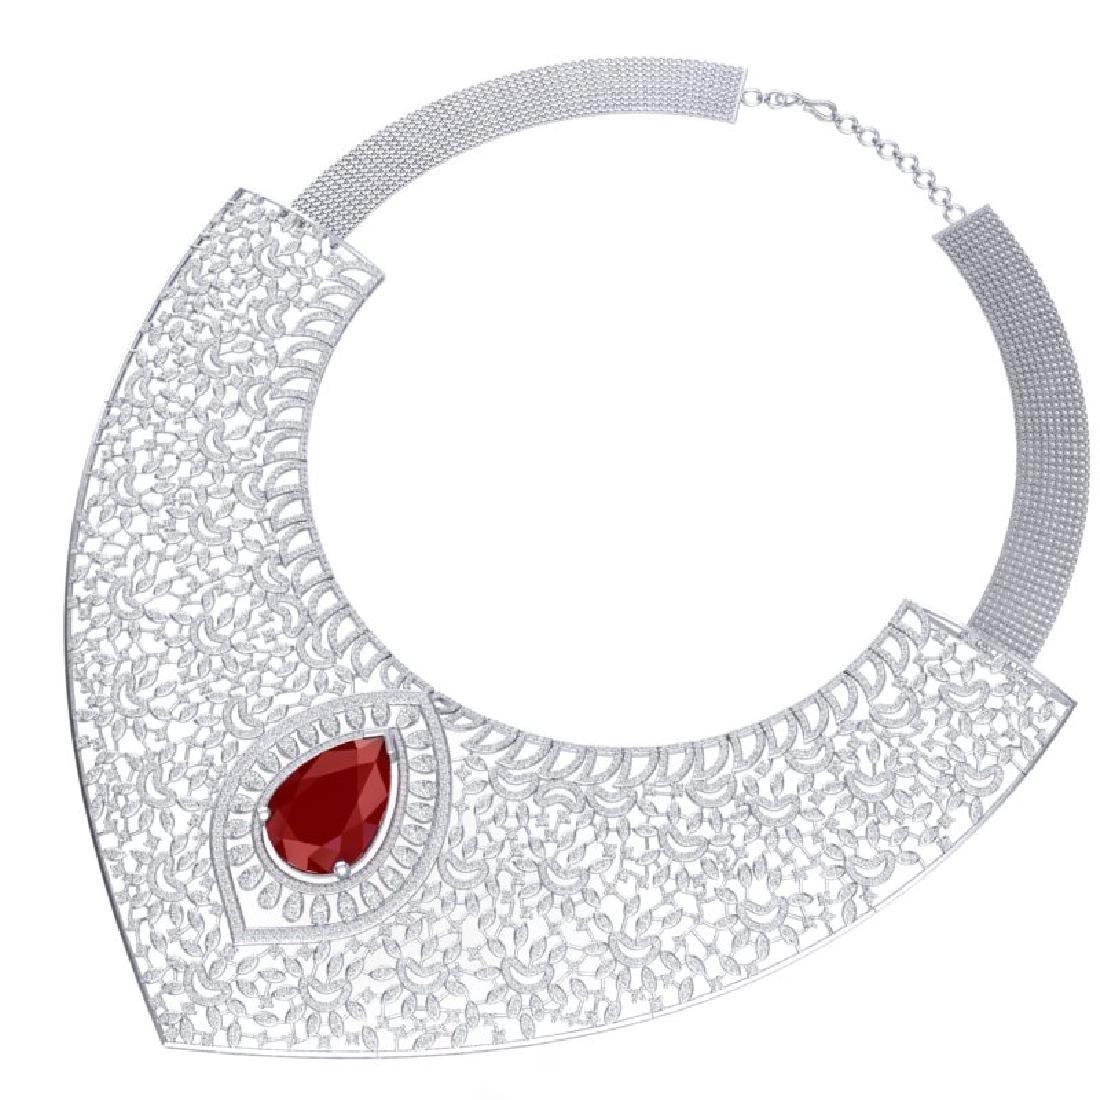 63.93 CTW Royalty Ruby & VS Diamond Necklace 18K White - 3